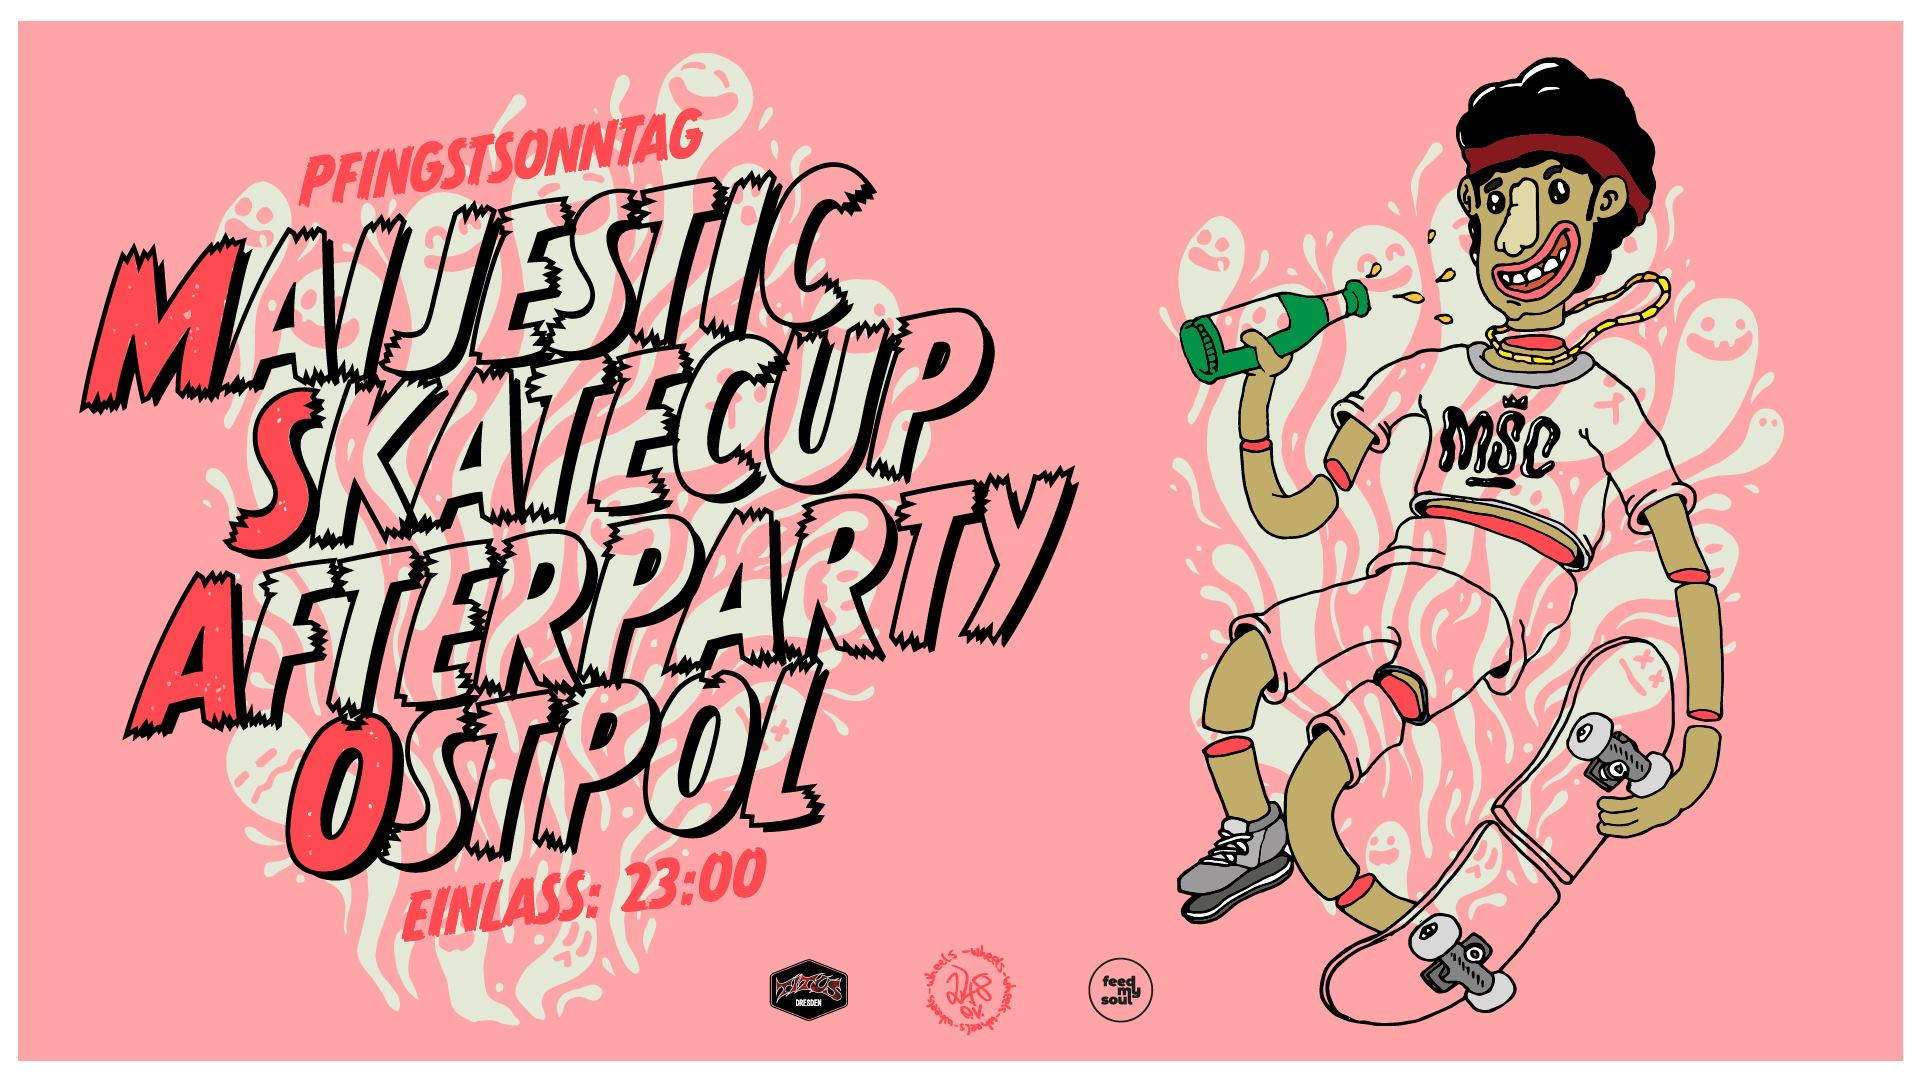 Maijestic Skatecup 2019 Aftershowparty im Ostpol Dresden